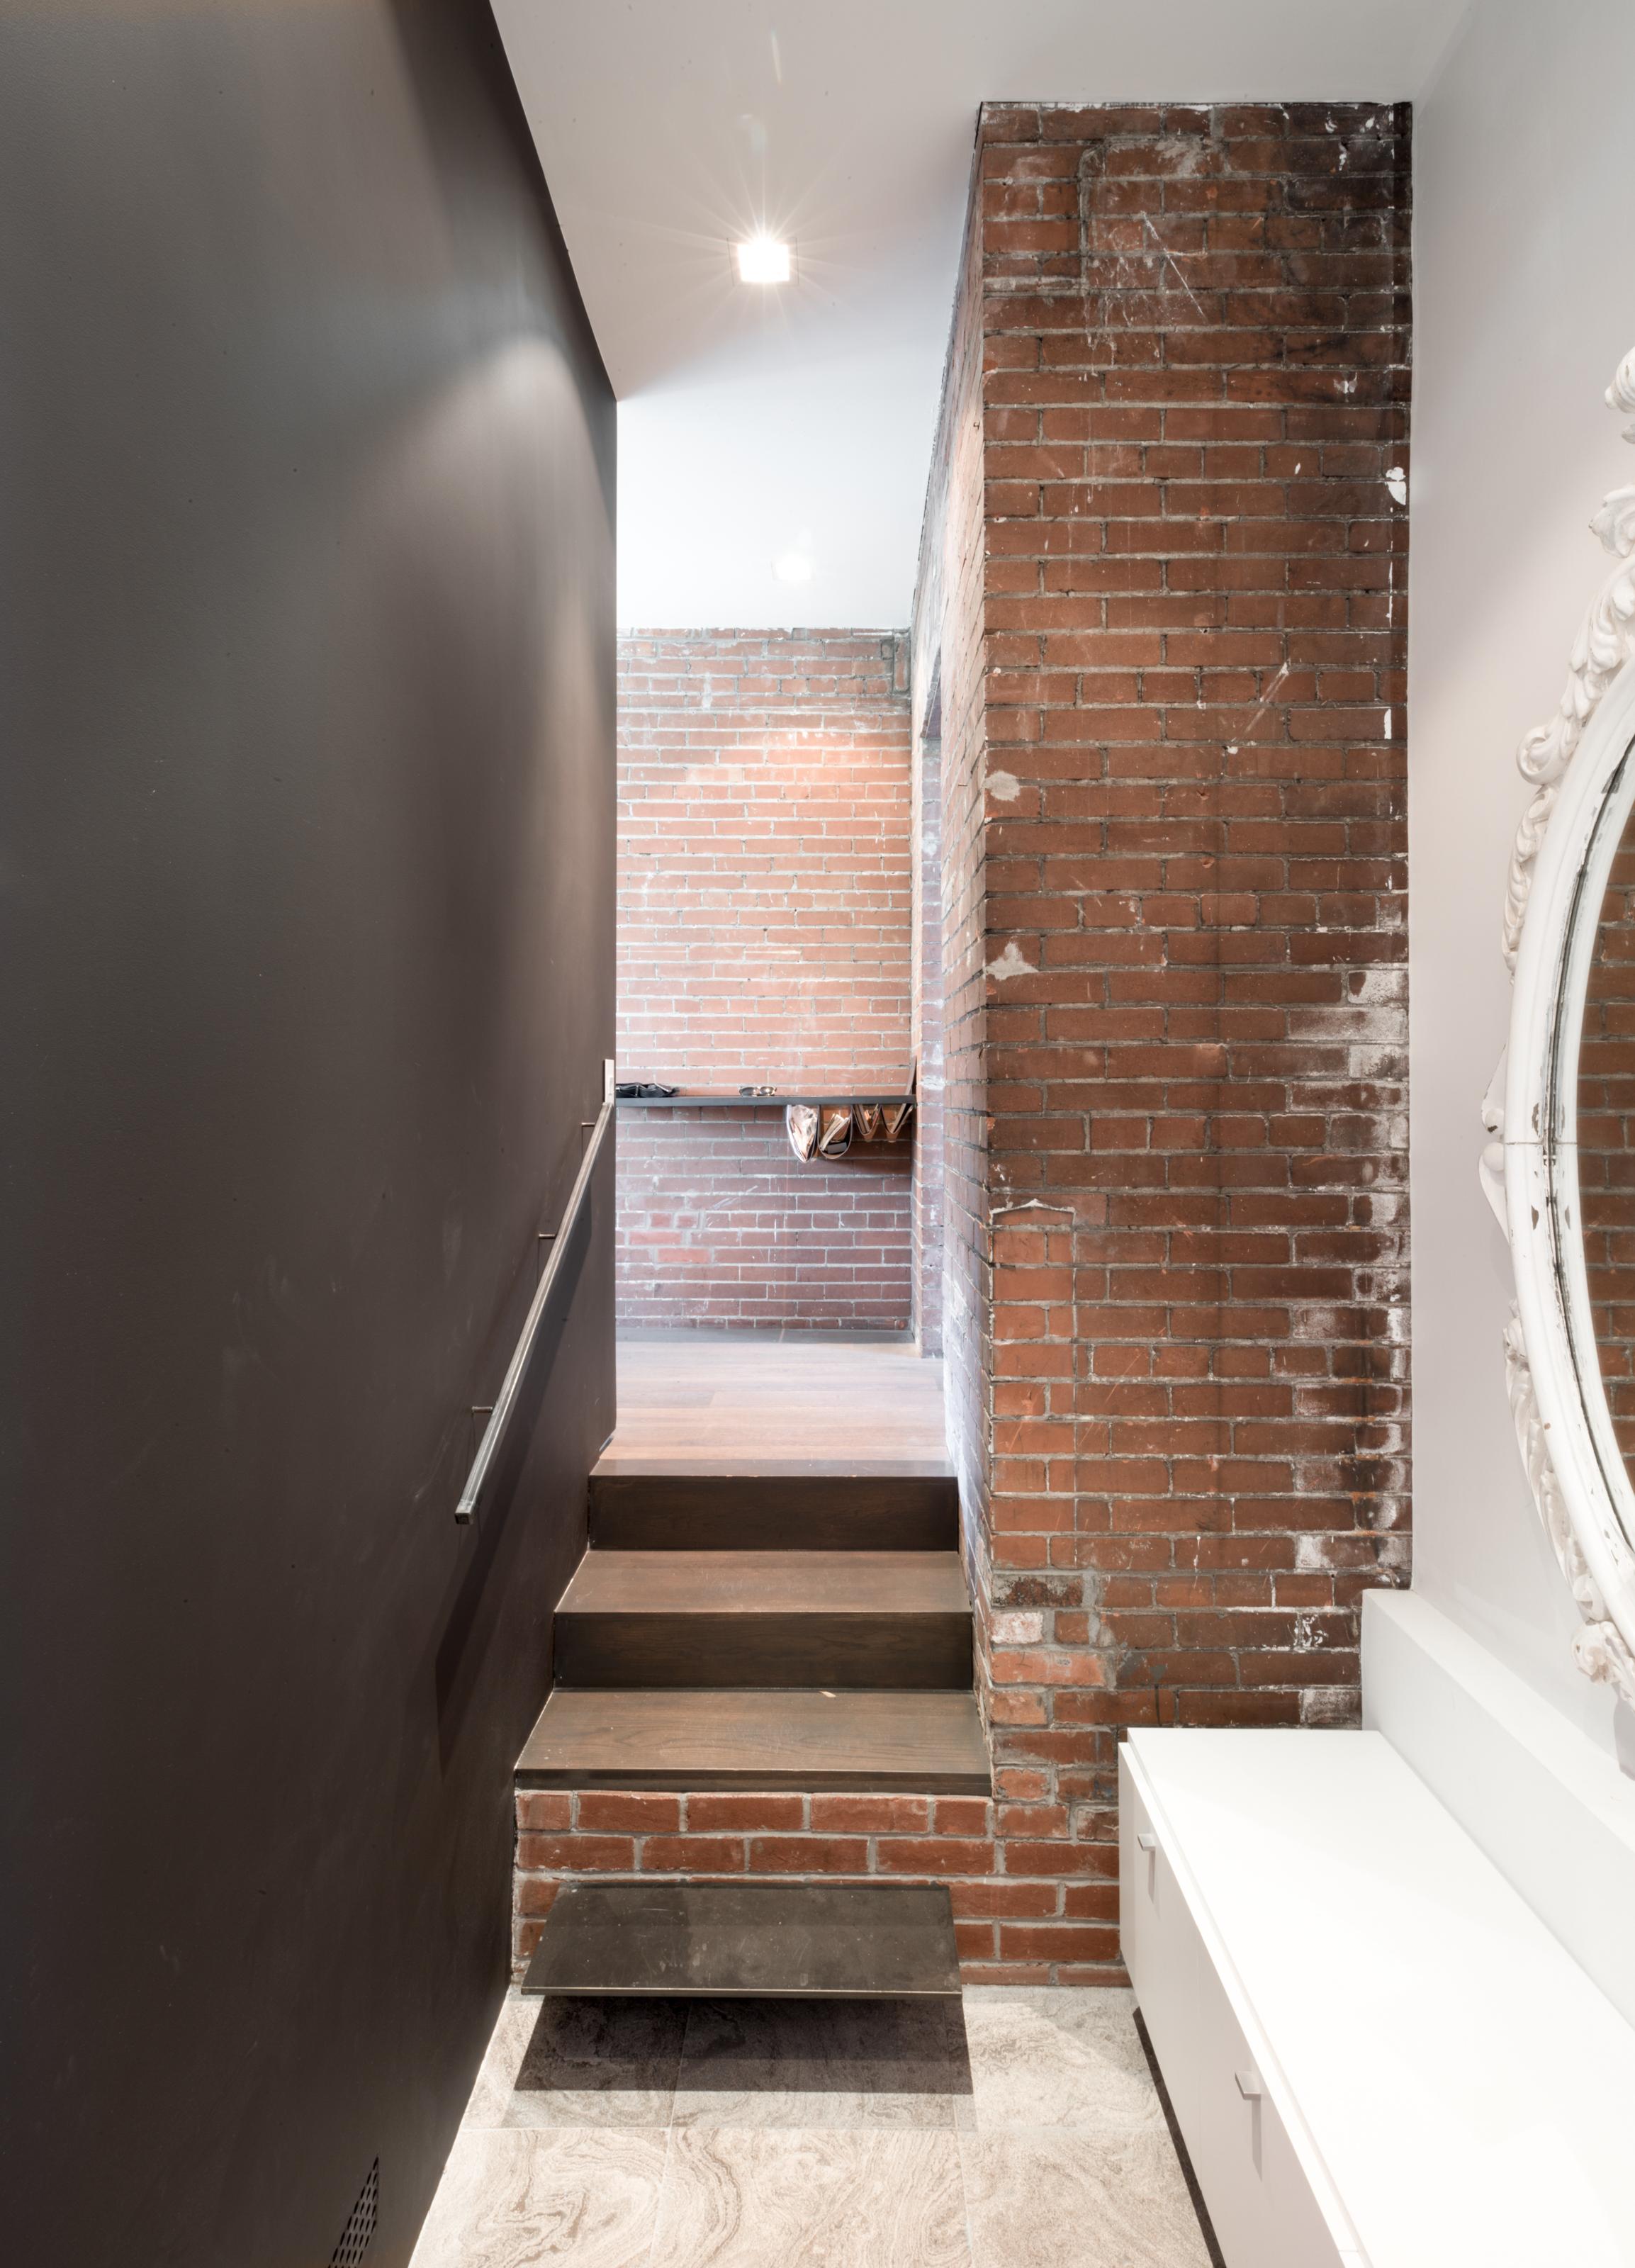 gh3 - Shorncliff Home - Entry Ledge